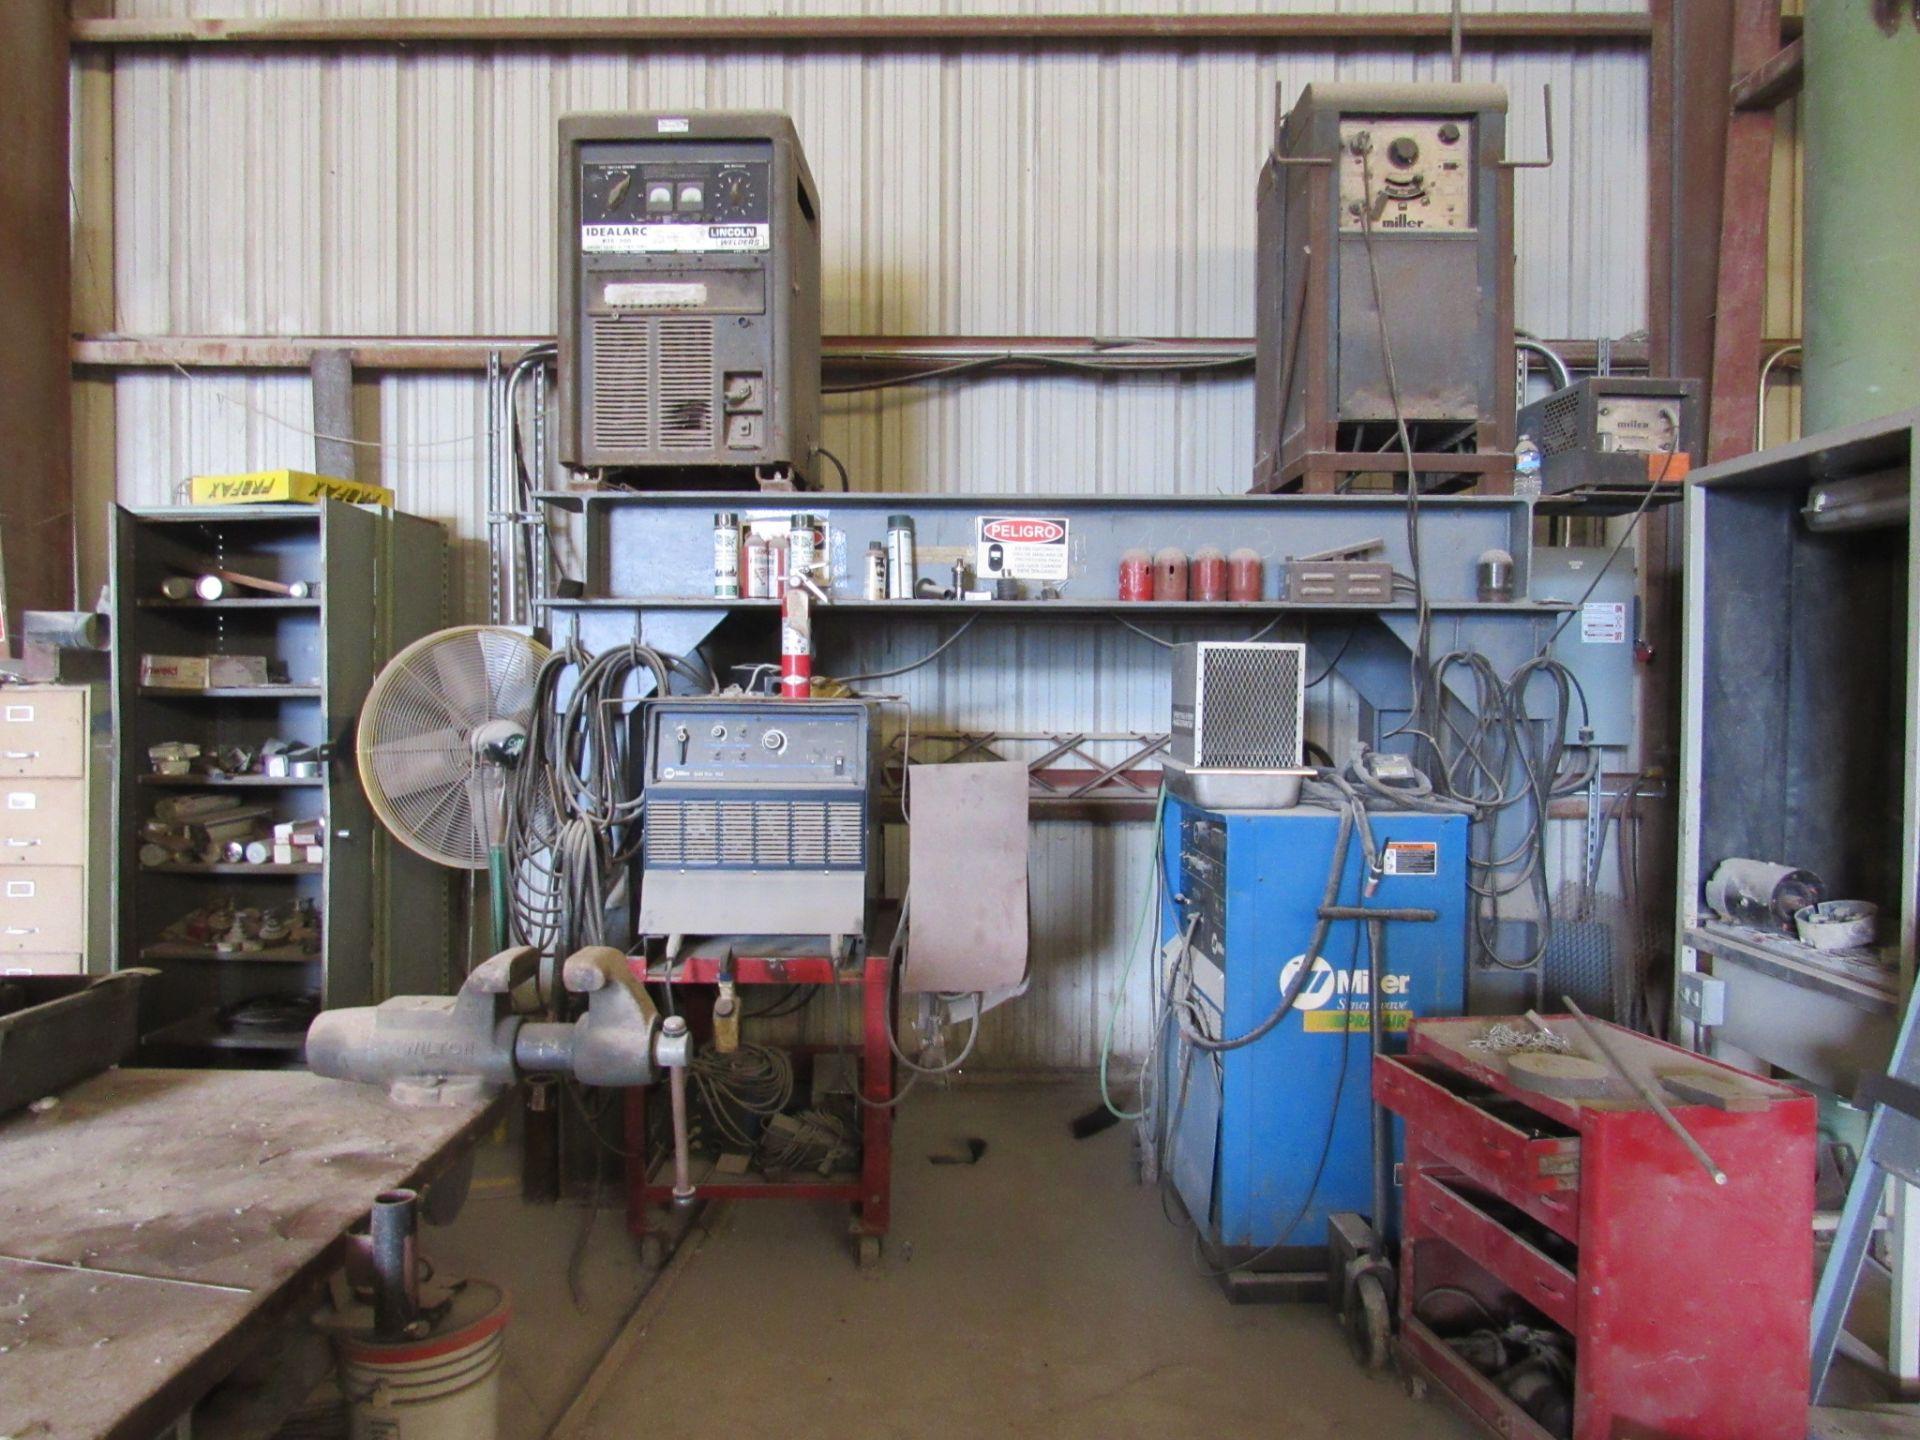 Welding Units and Equipment